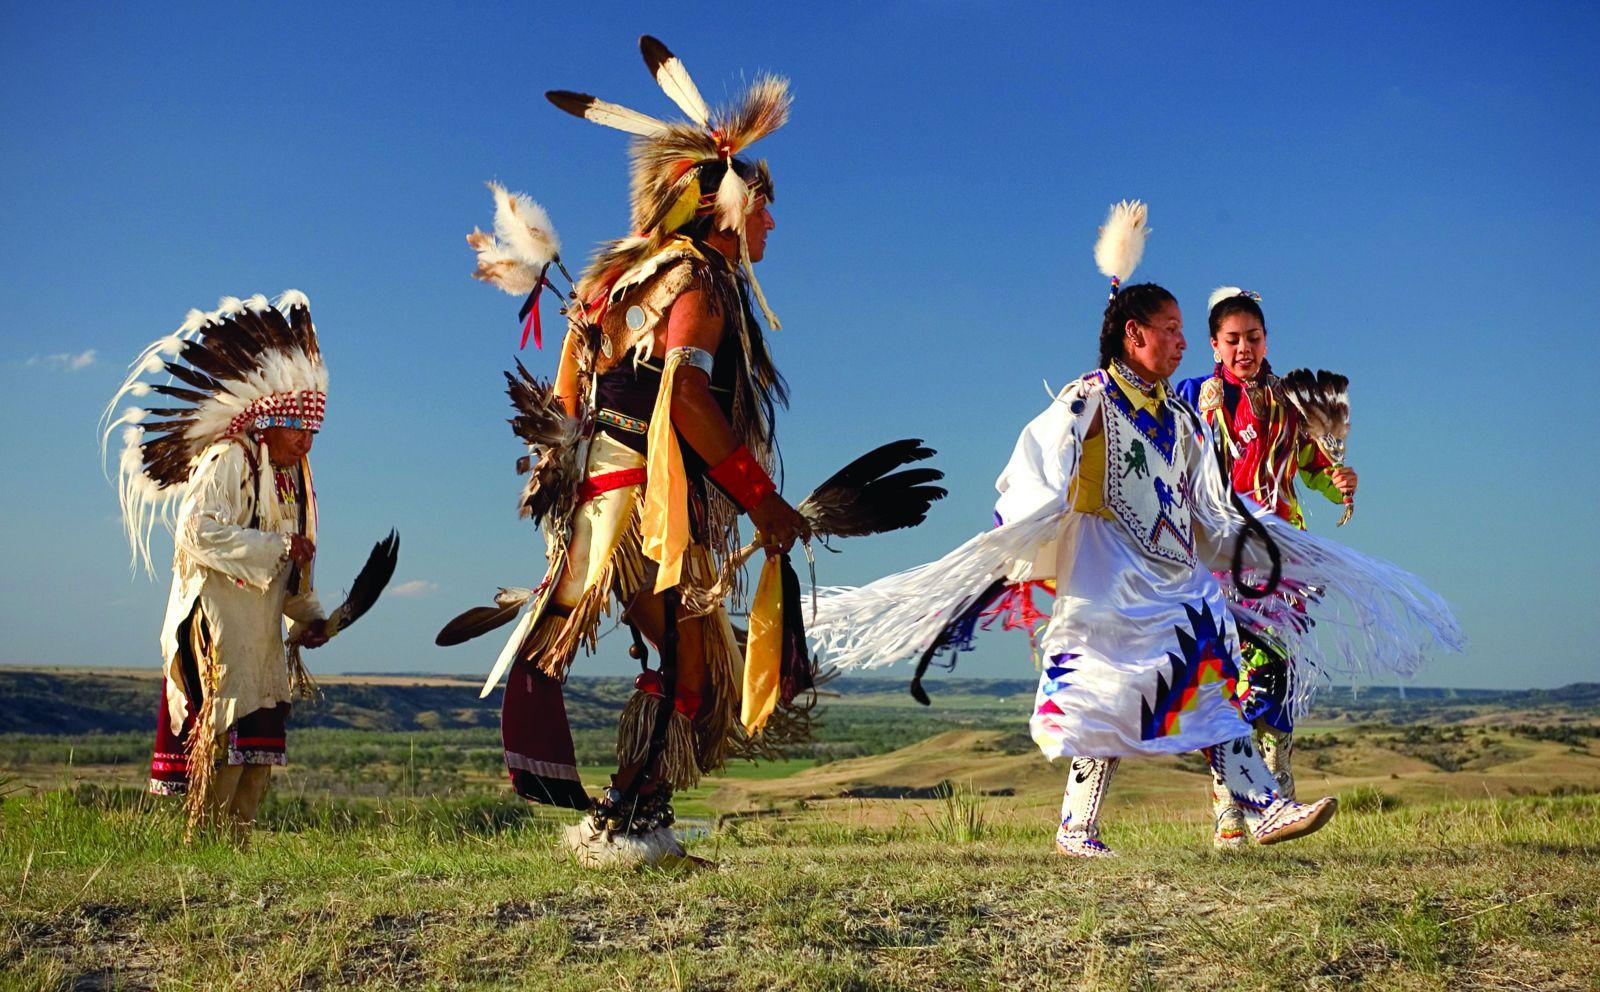 Indianer kleidung foto